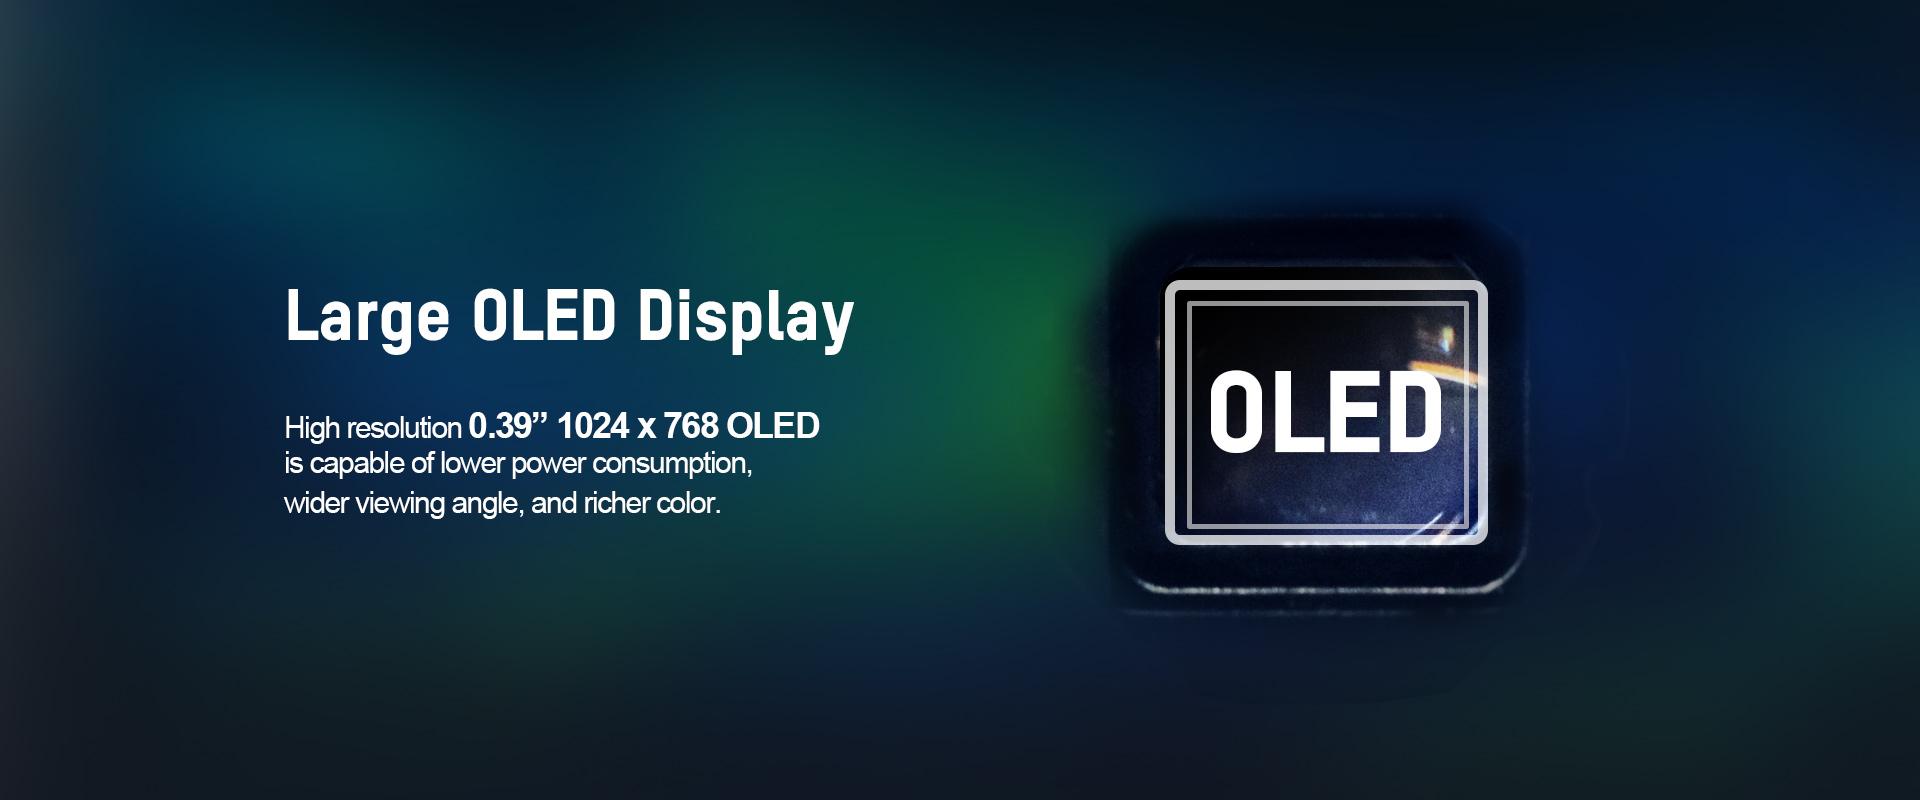 02-Large OLED Display_TS16.jpg